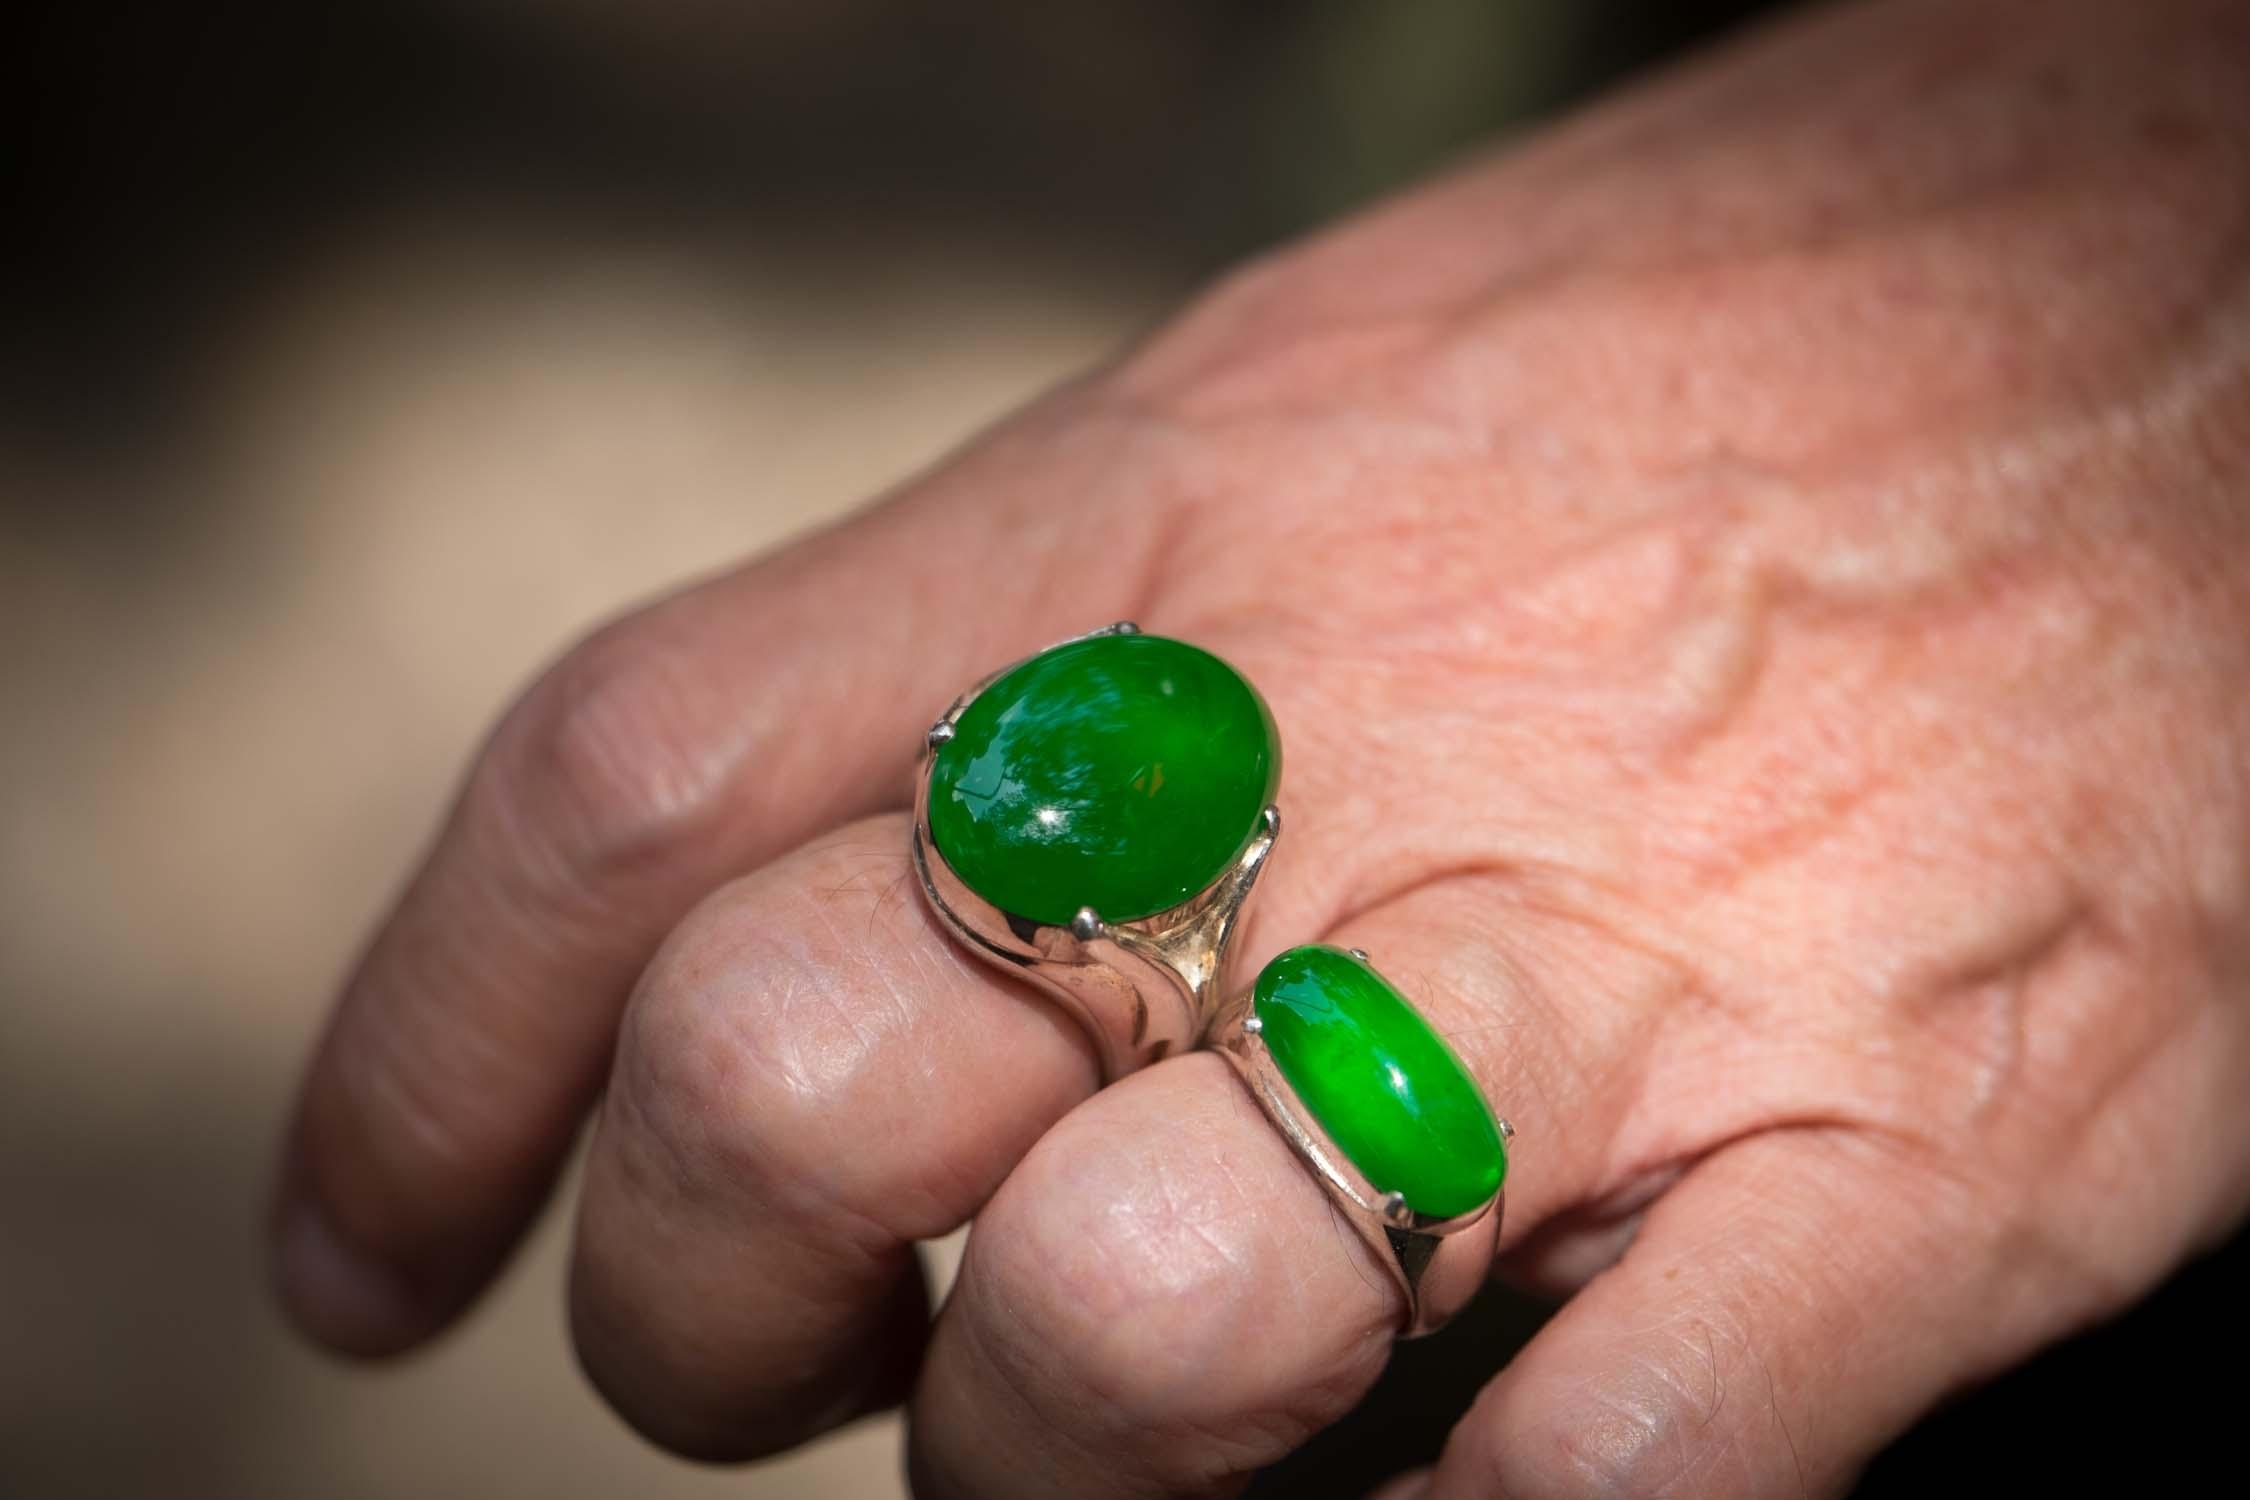 Top quality imperial jade as seen worn by a well known jade dealer in Yangon, Myanmar